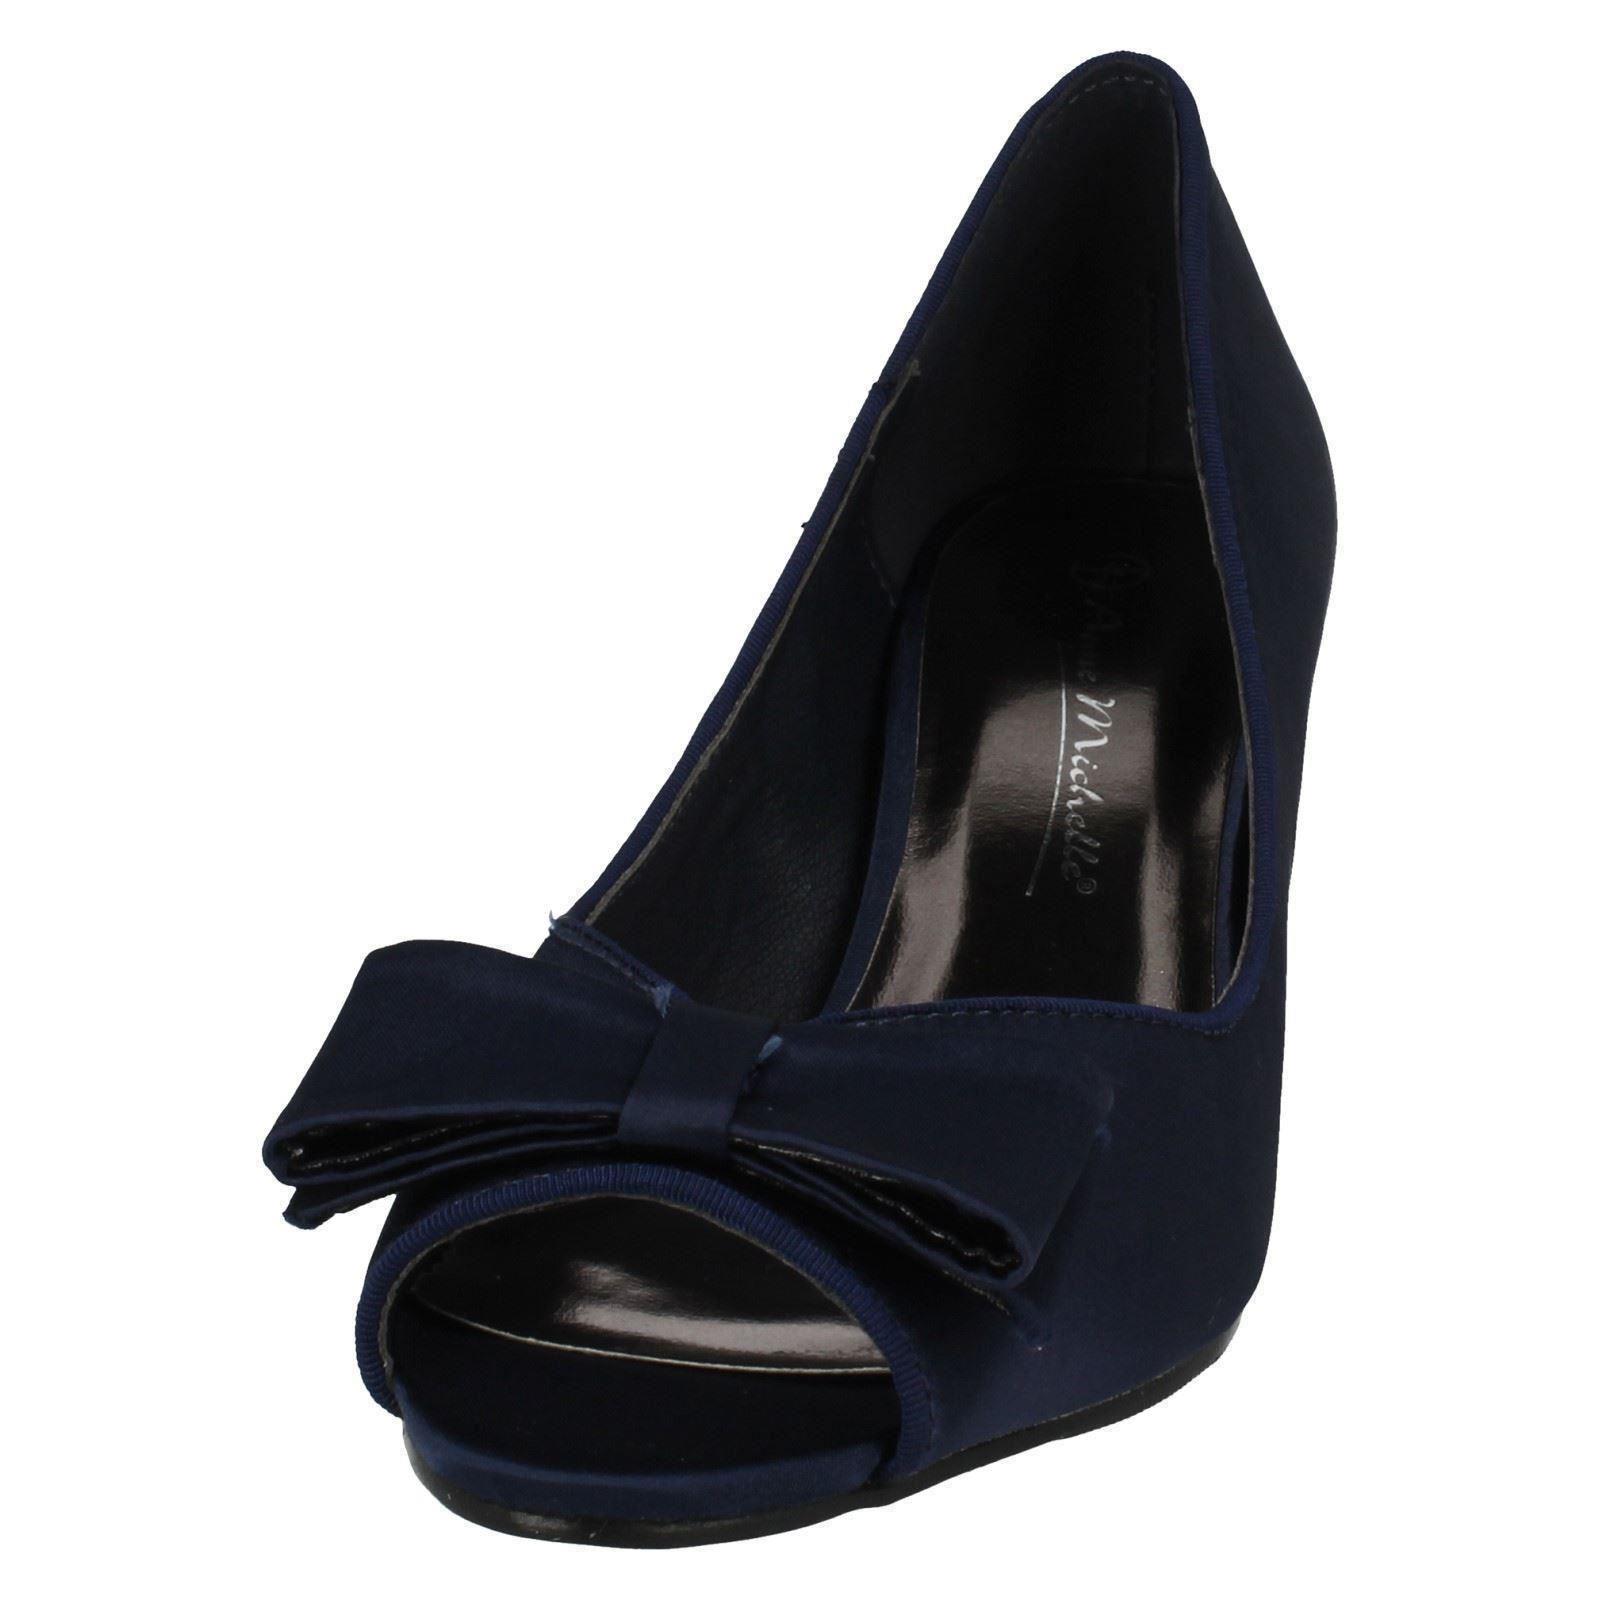 Damas Anne Michelle Zapatos Formales Etiqueta F10308-W